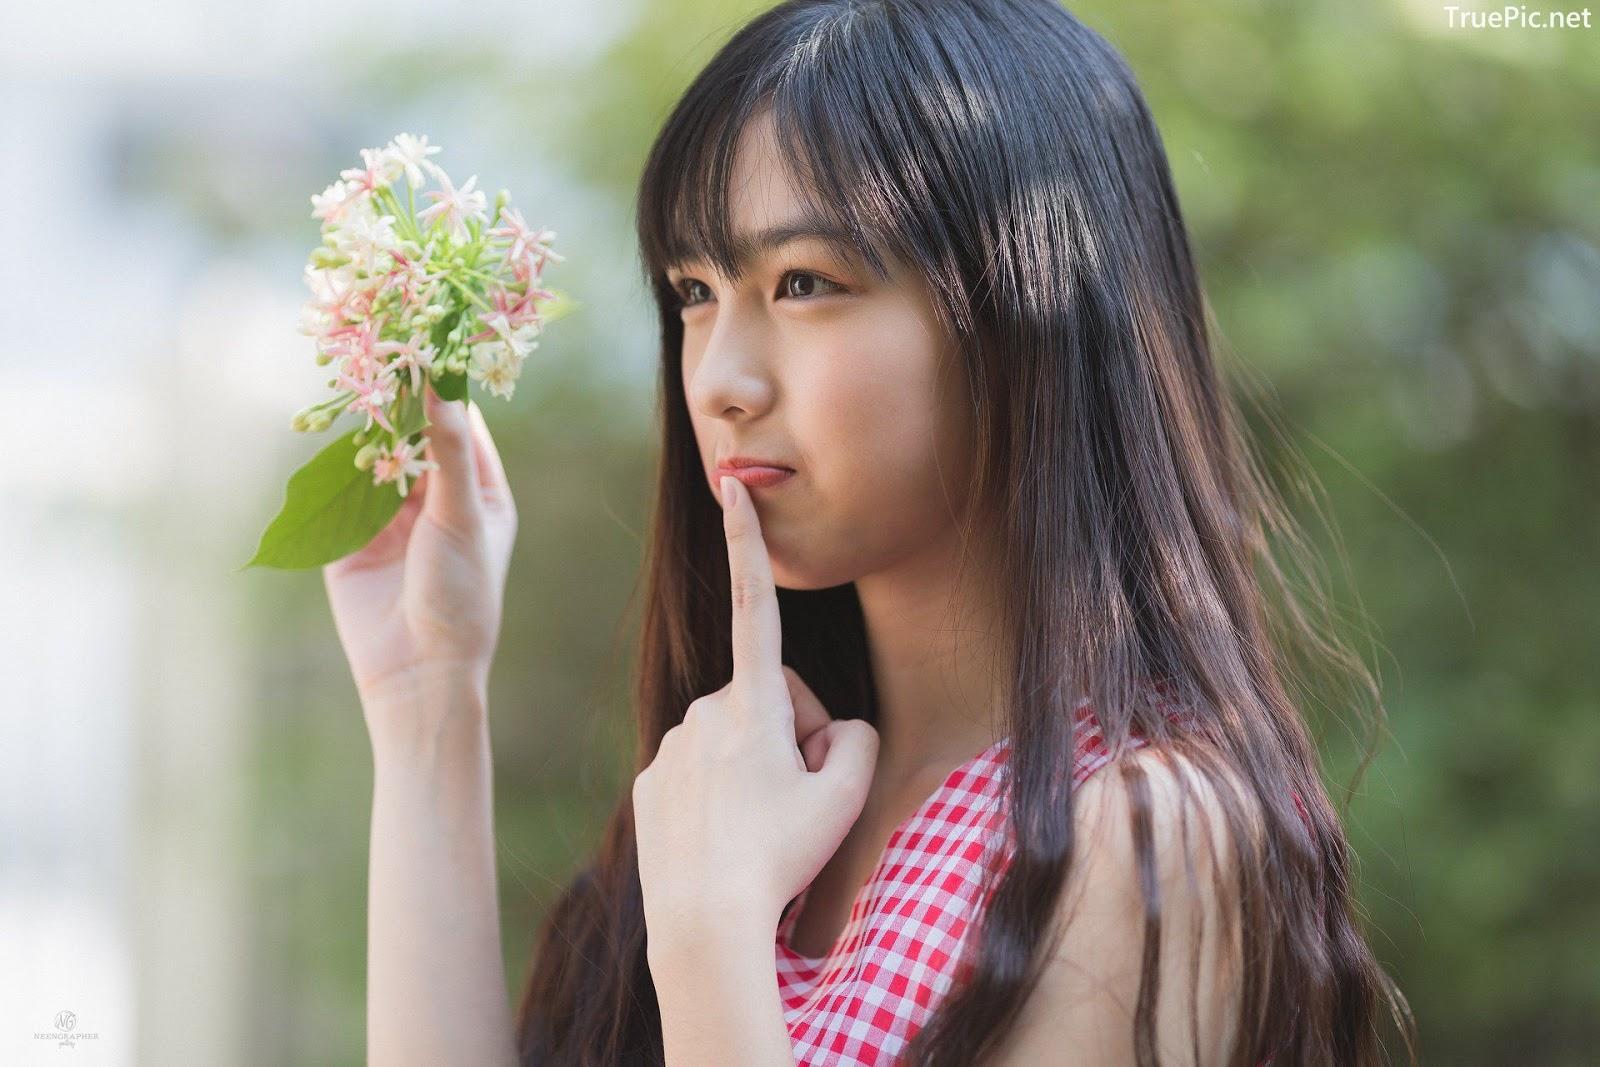 Image-Thailand-Cute-Model-Emma-Panisara–Album-Emma-Bright-Sunday-TruePic.net- Picture-15